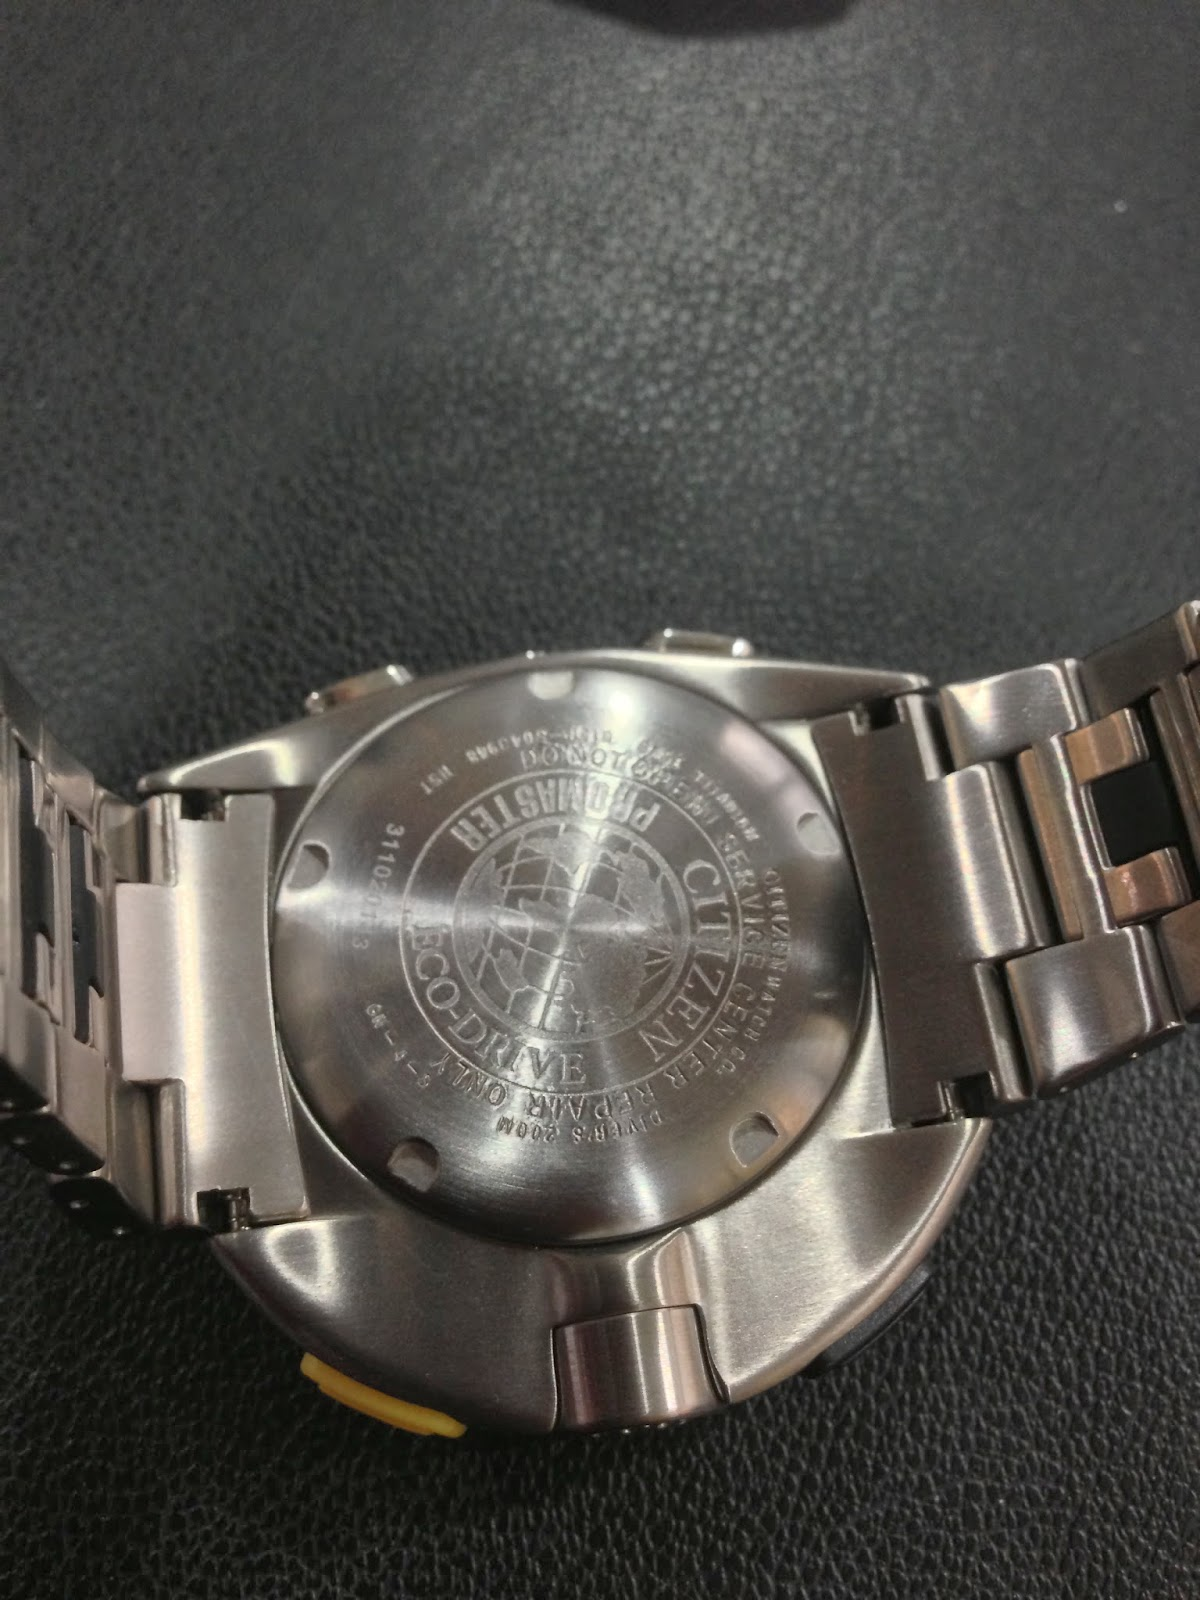 foto di orologi citizen falsi